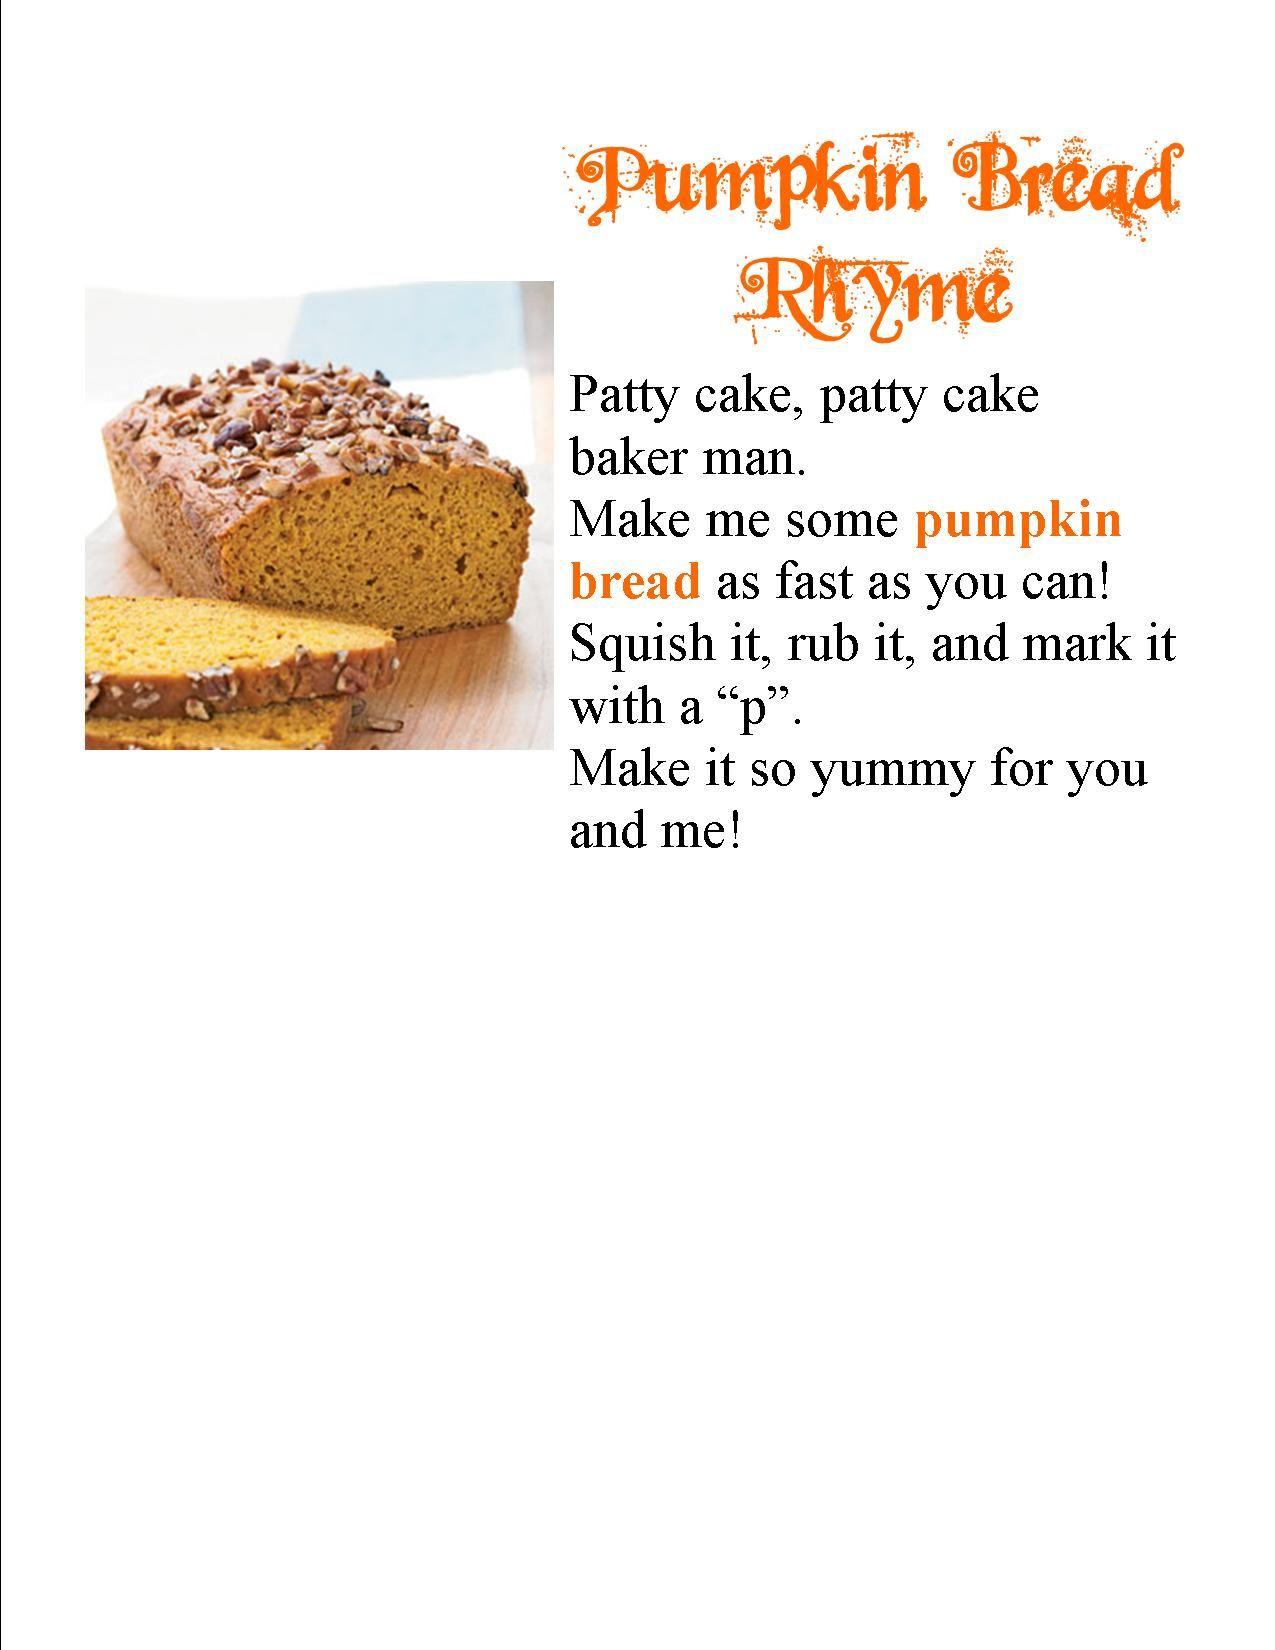 Pumpkin Bread Rhyme With Images Pumpkin Bread Food Pumpkin